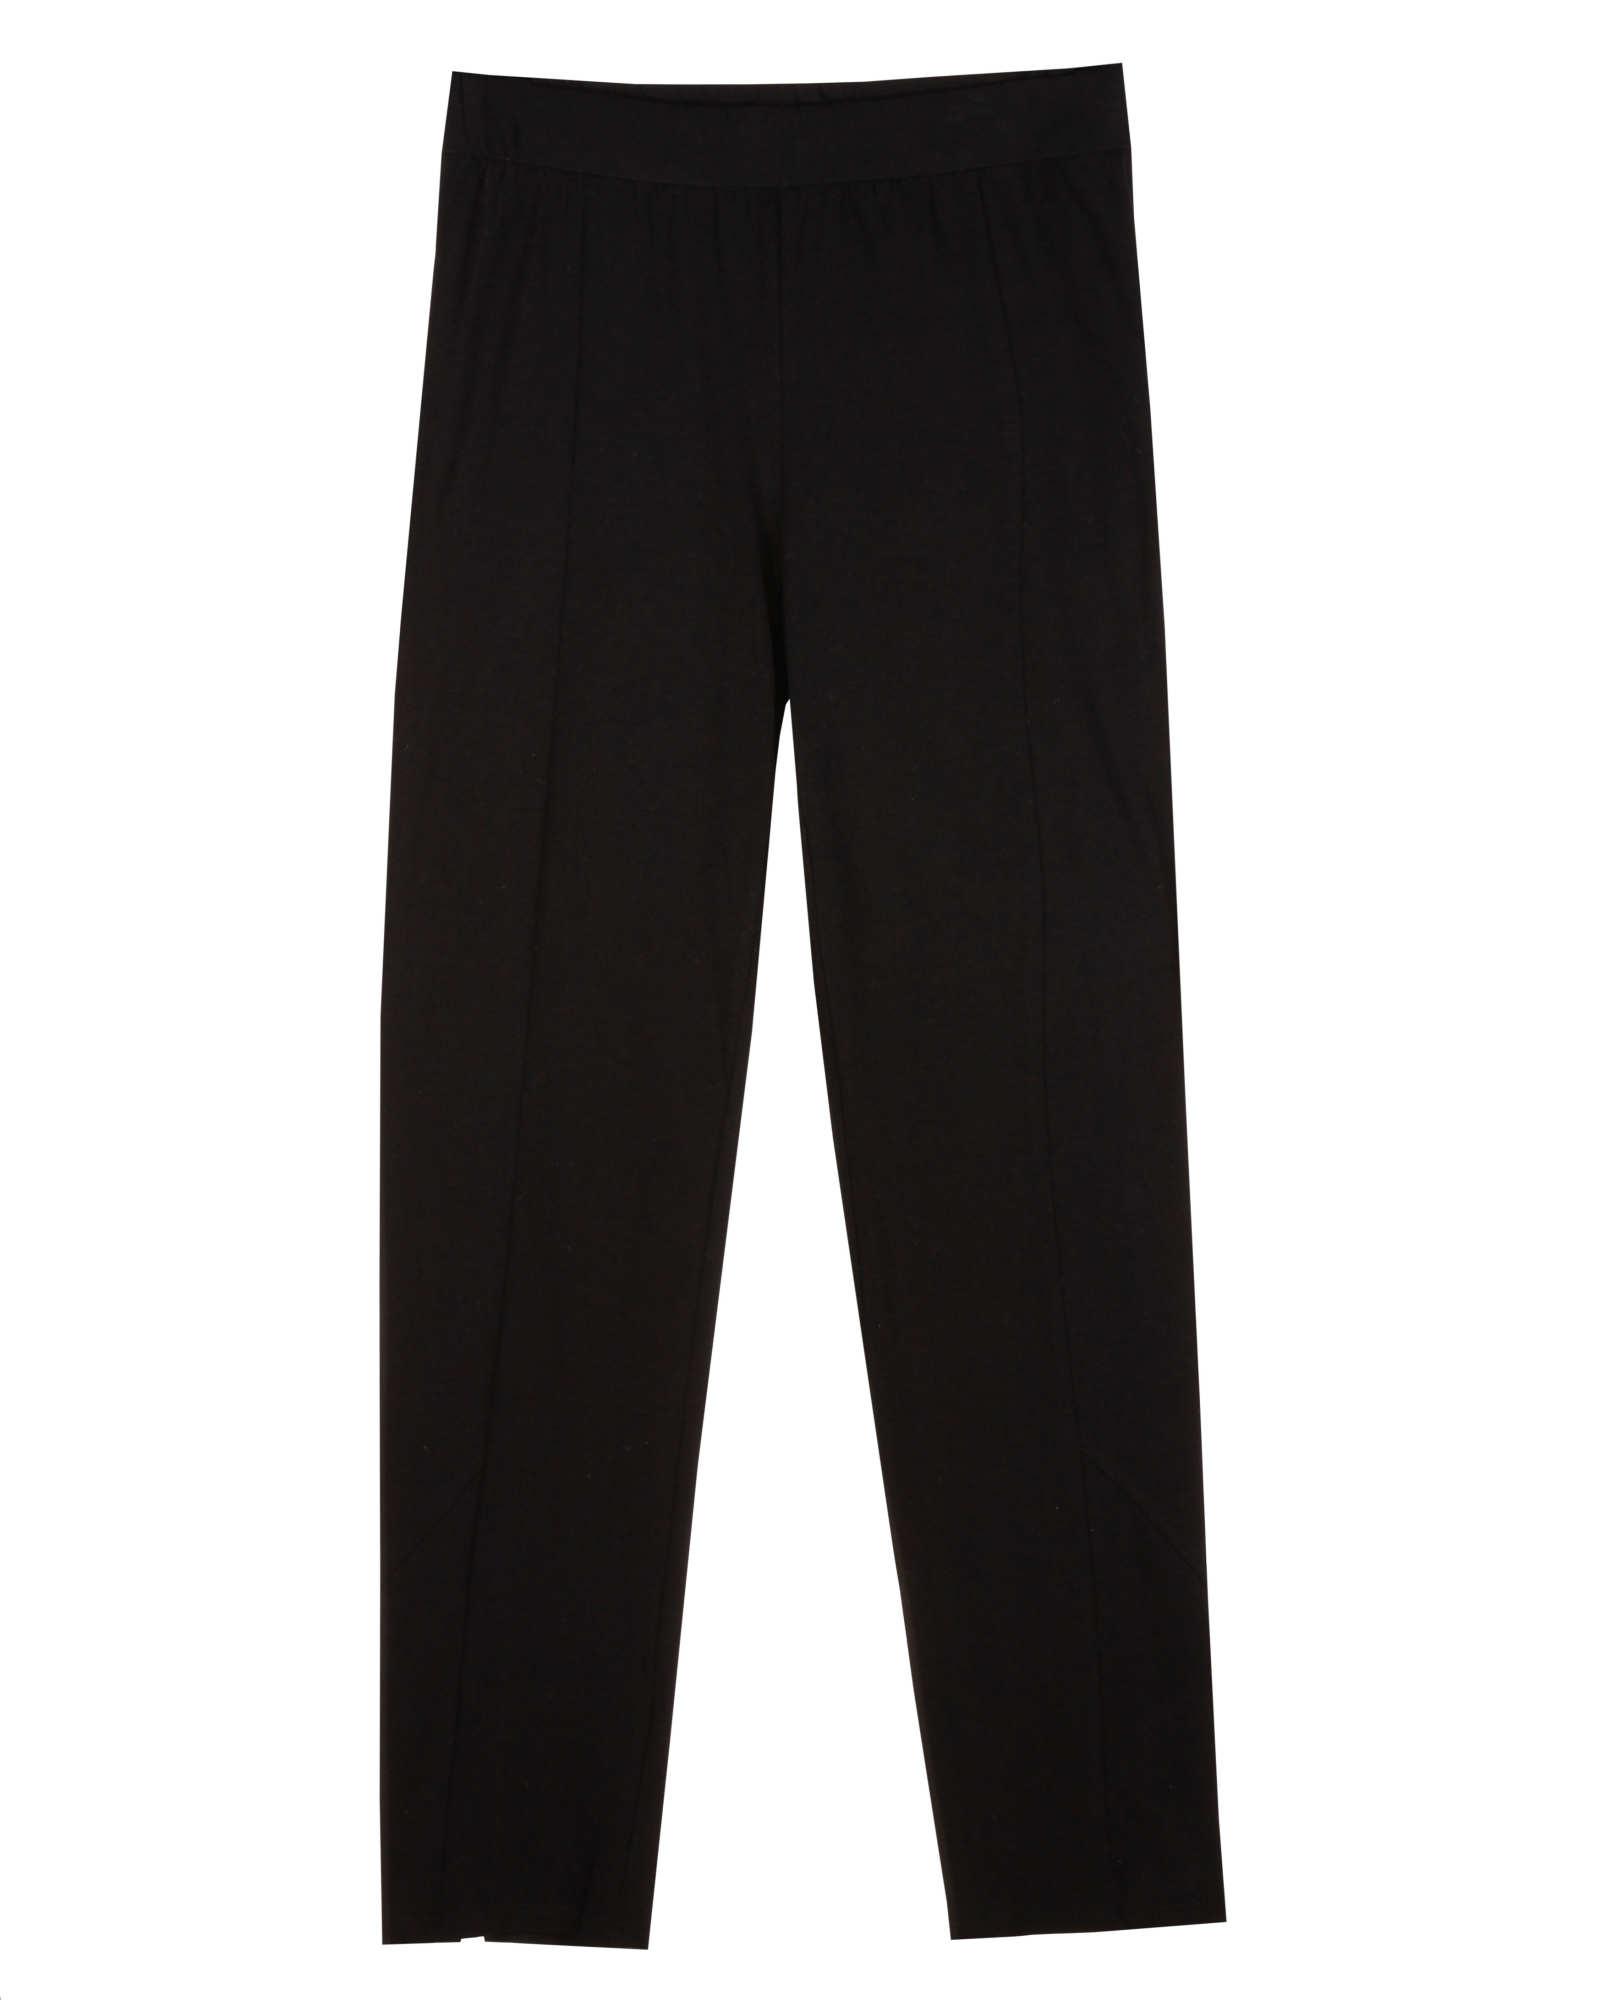 Organic Cotton Stretch Jersey Pant